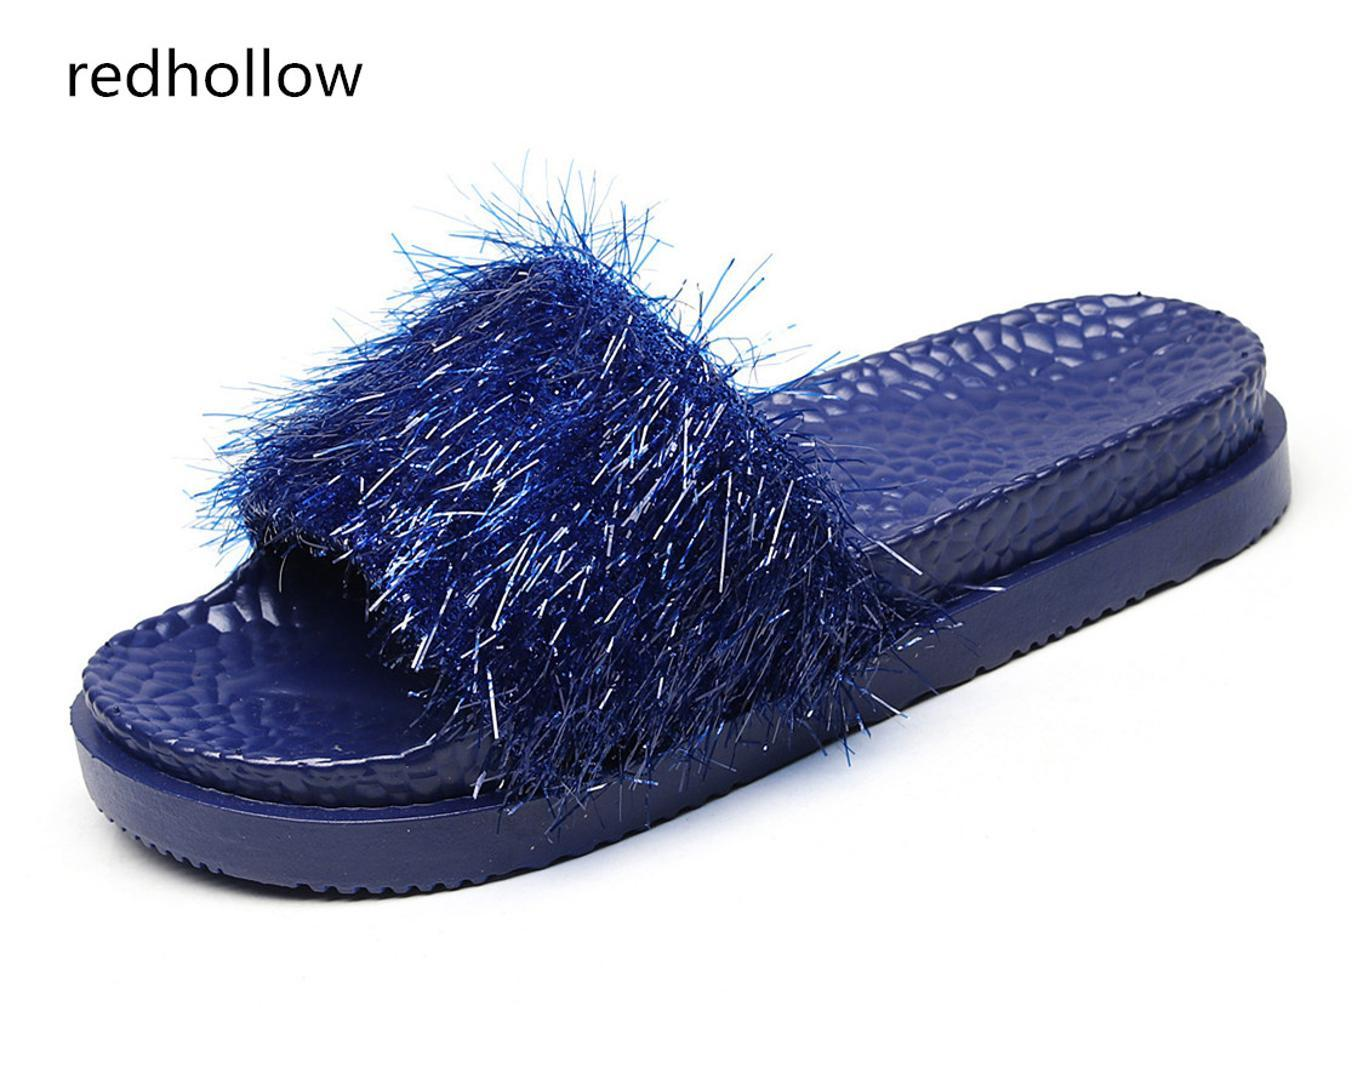 46bcf189bfbd Fashion Women Slides Summer Slippers Platform Beach Sandals Flip Flips Ladies  Flat Heel Shoes Slippers Bling Women Home Girls Shoes Bearpaw Boots From ...